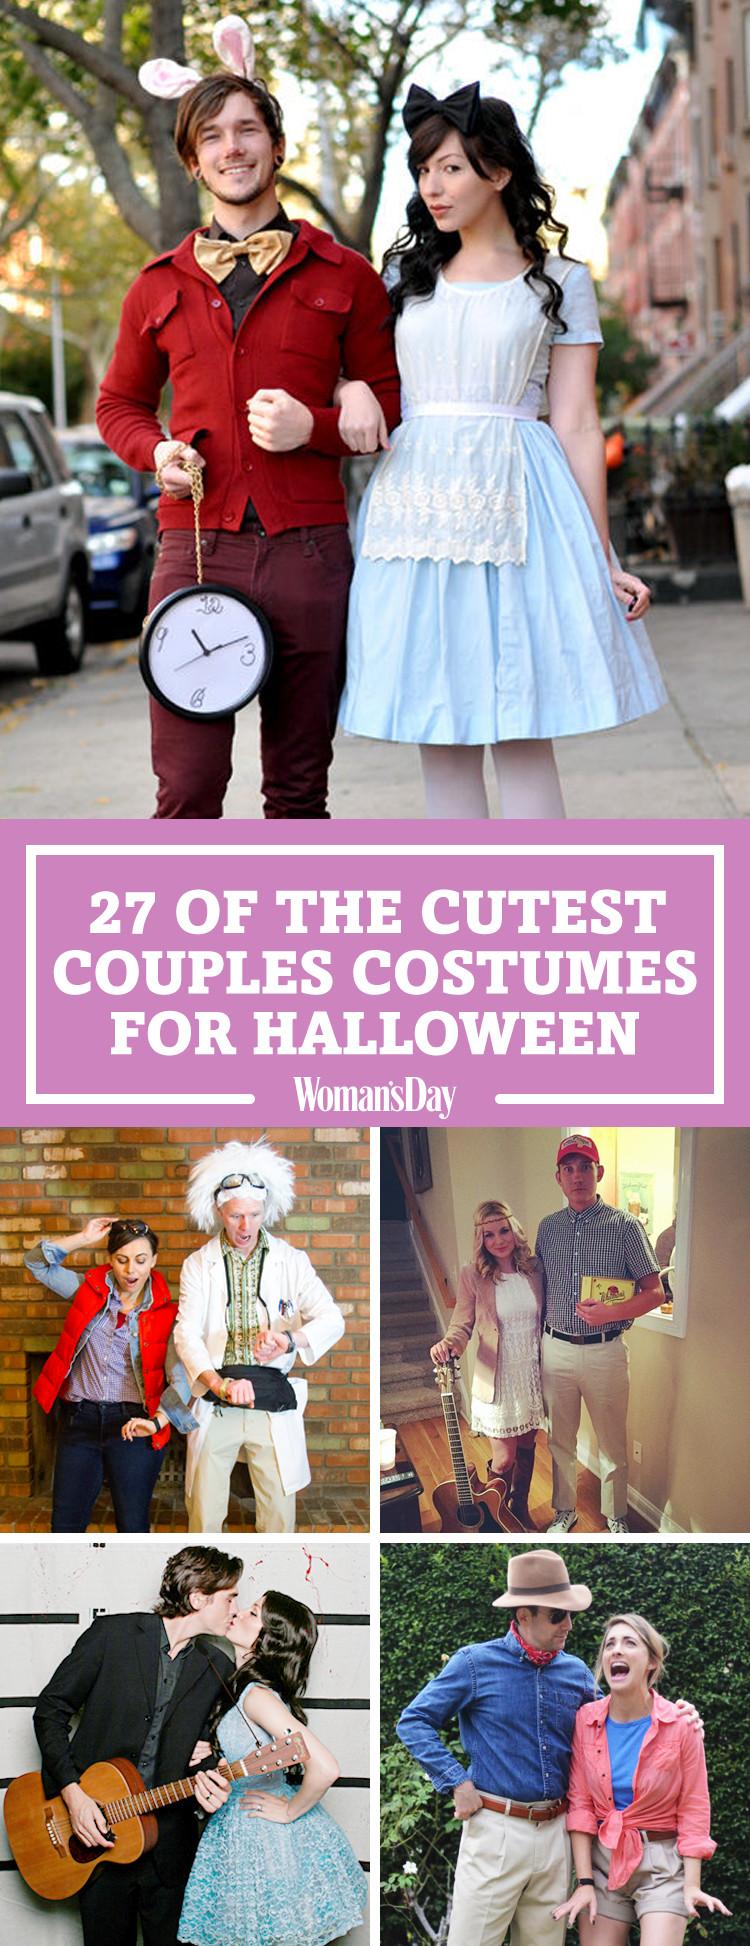 Halloween Costume Ideas For Couples | POPSUGAR Entertainment